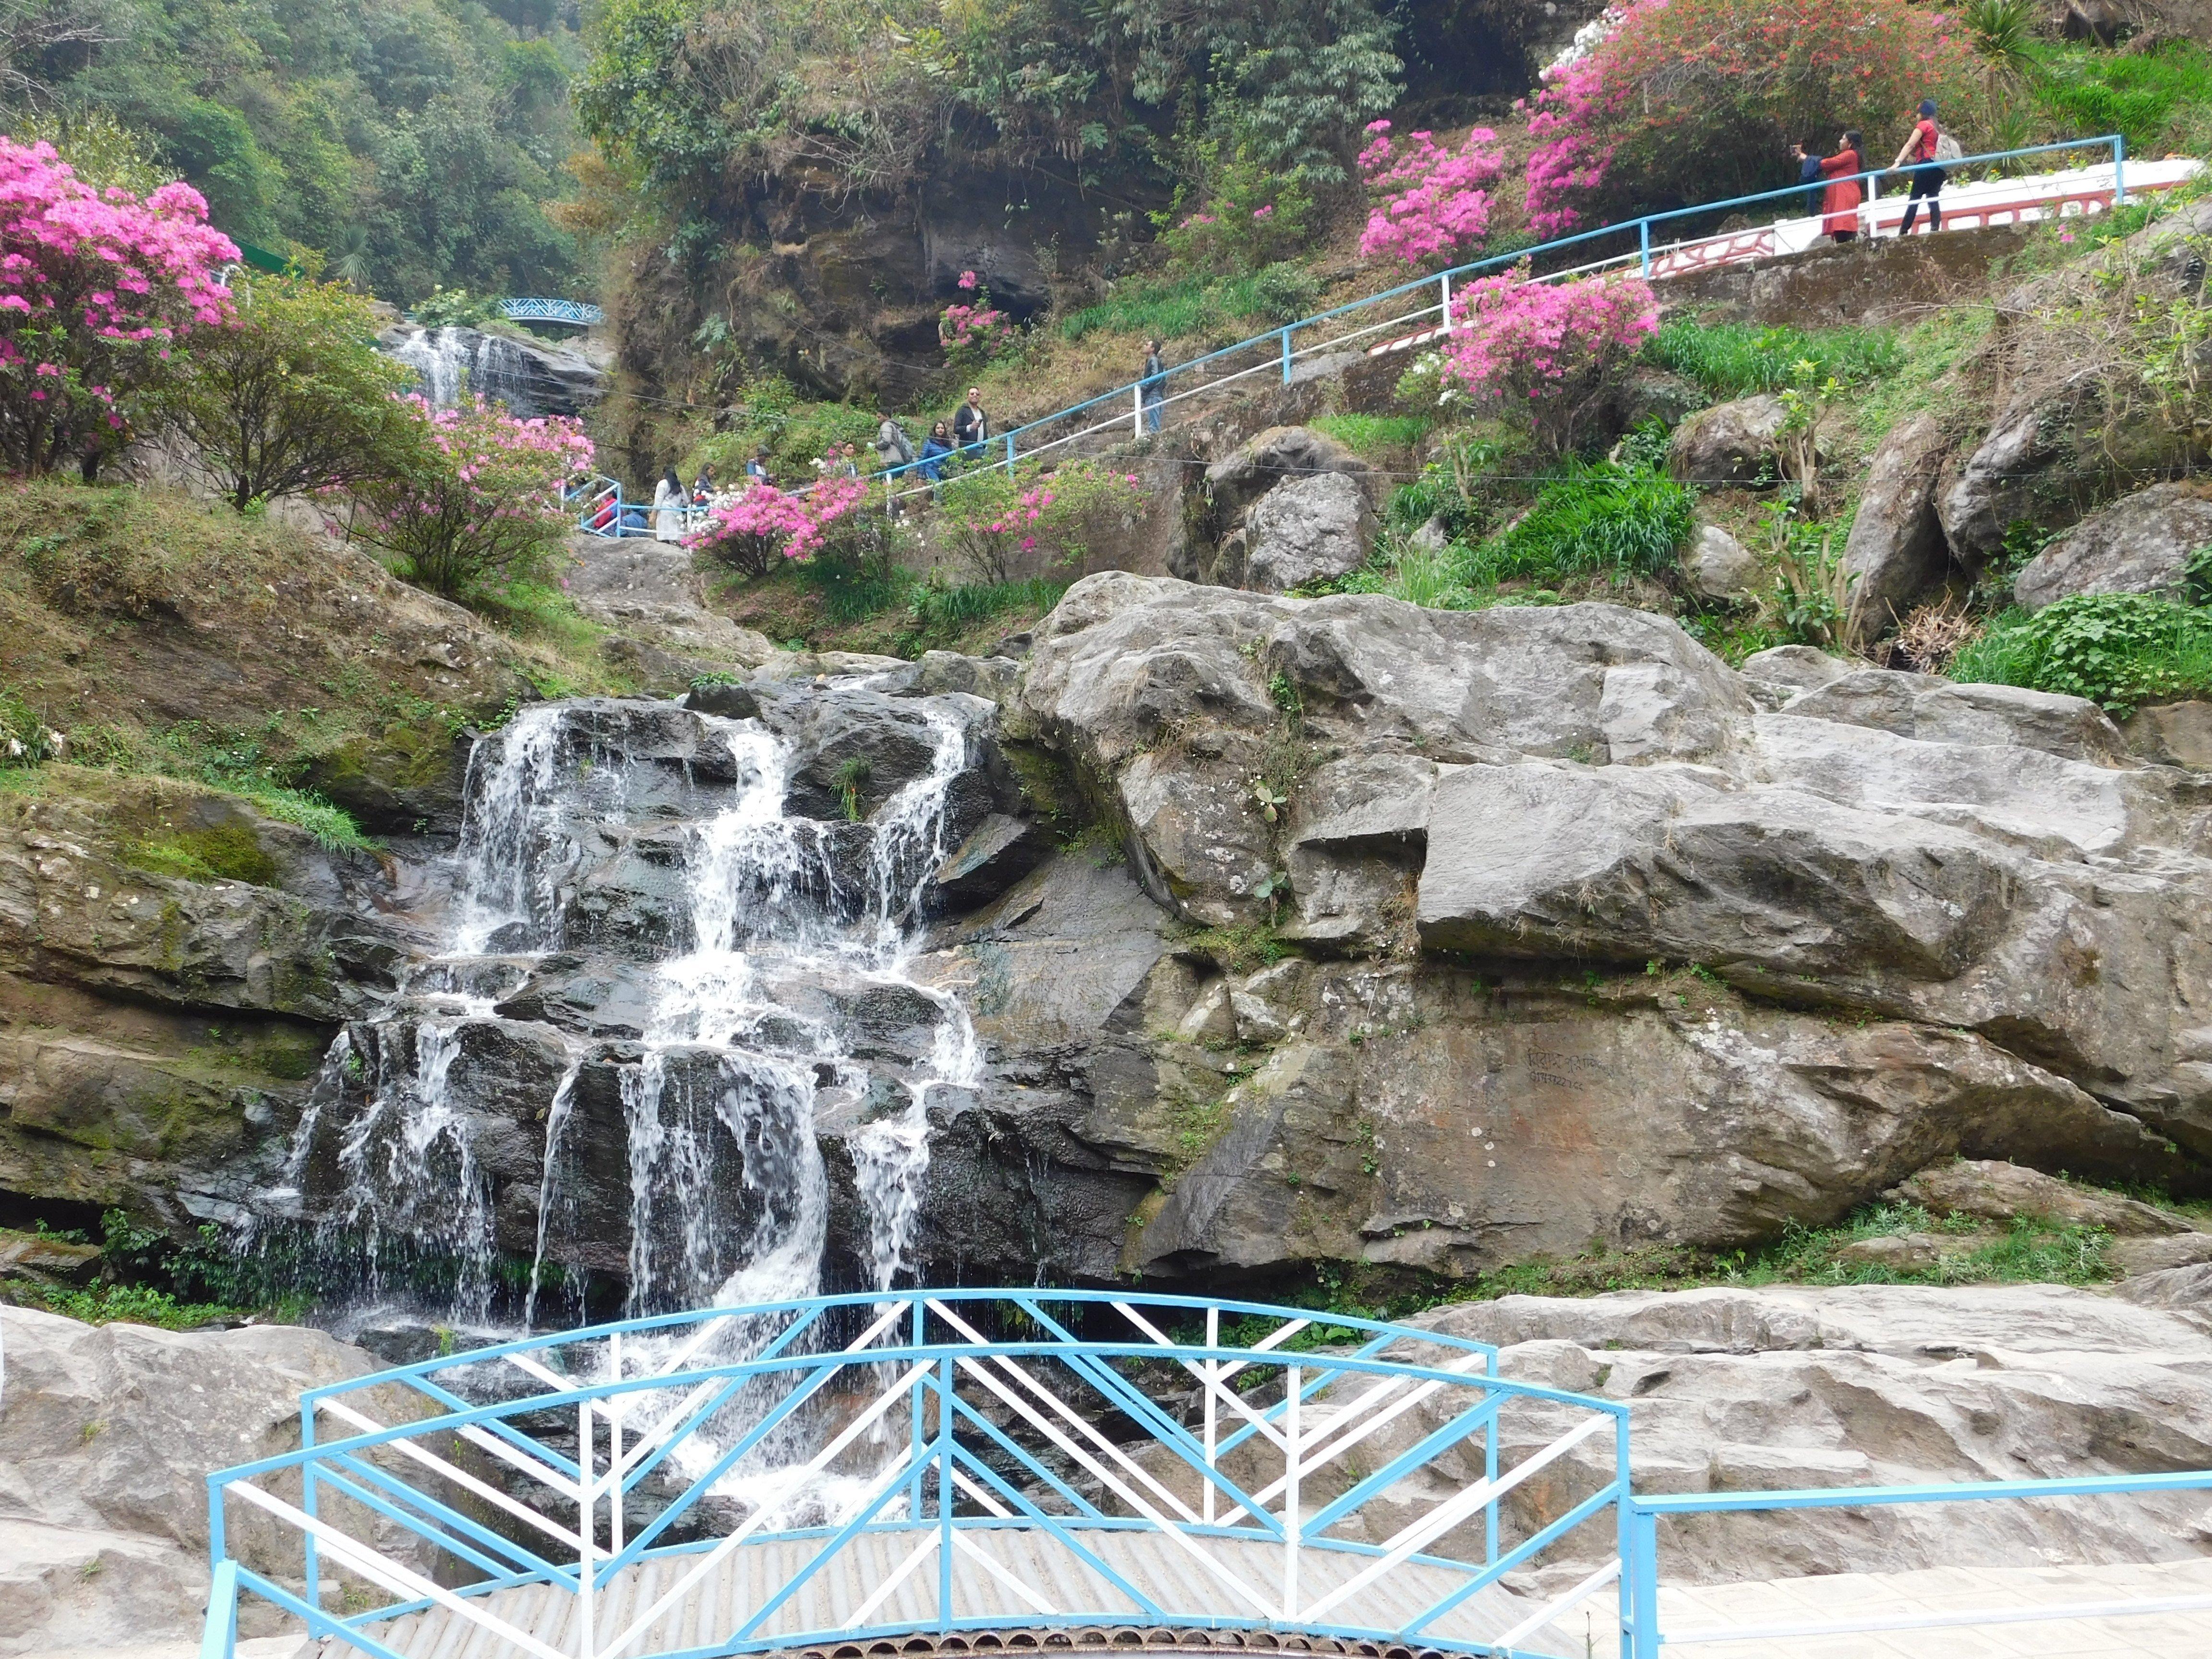 Darjeeling rock garden